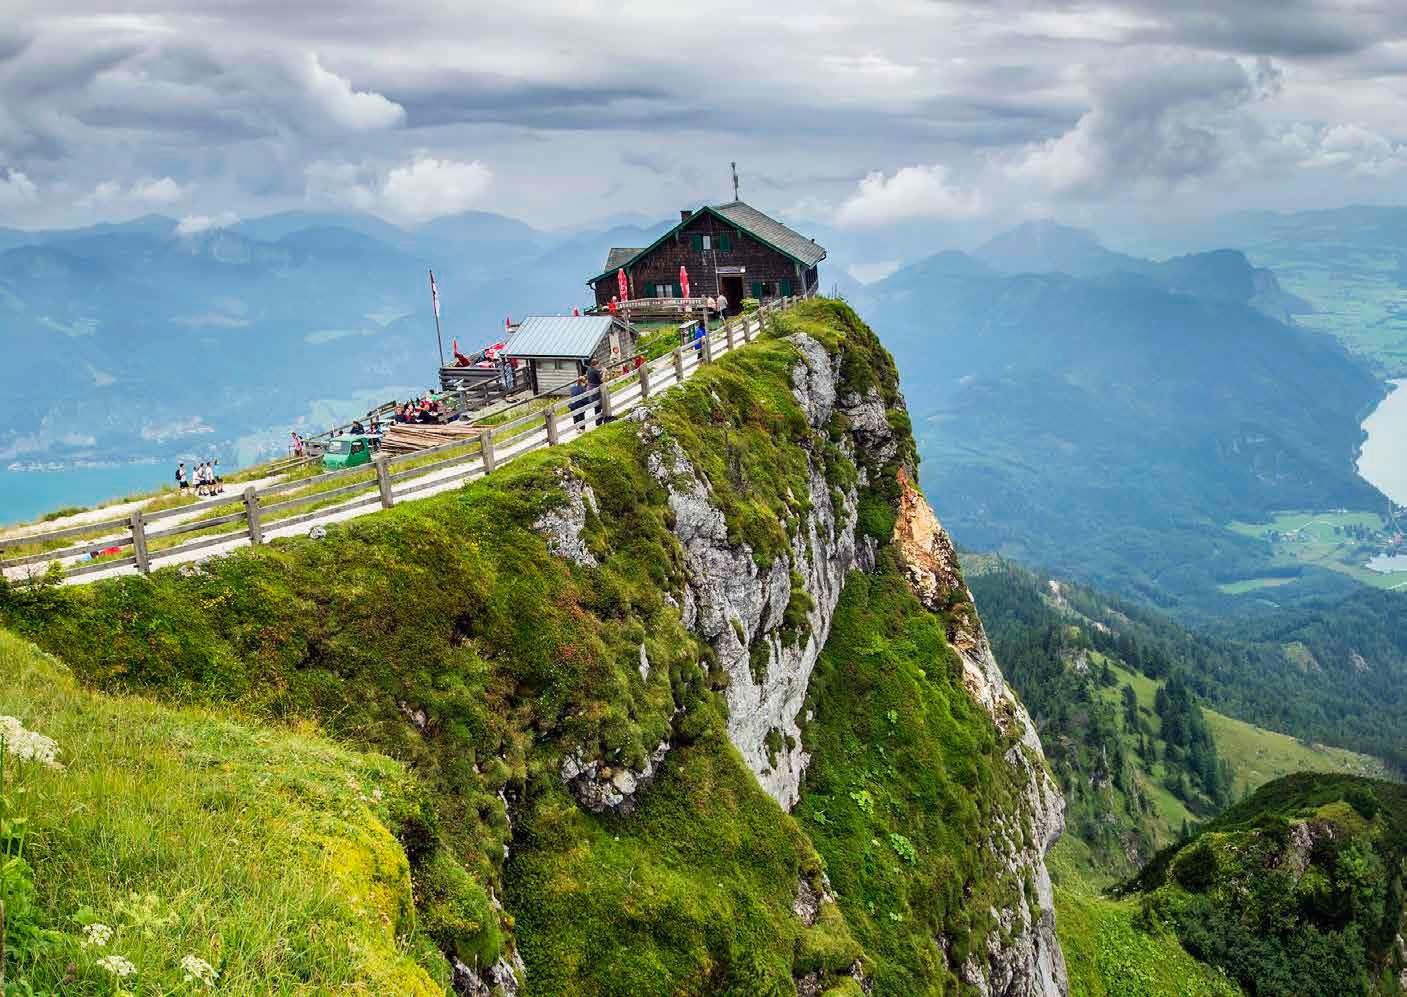 hotel schafbergspitze austria s oldest mountain hotel. Black Bedroom Furniture Sets. Home Design Ideas